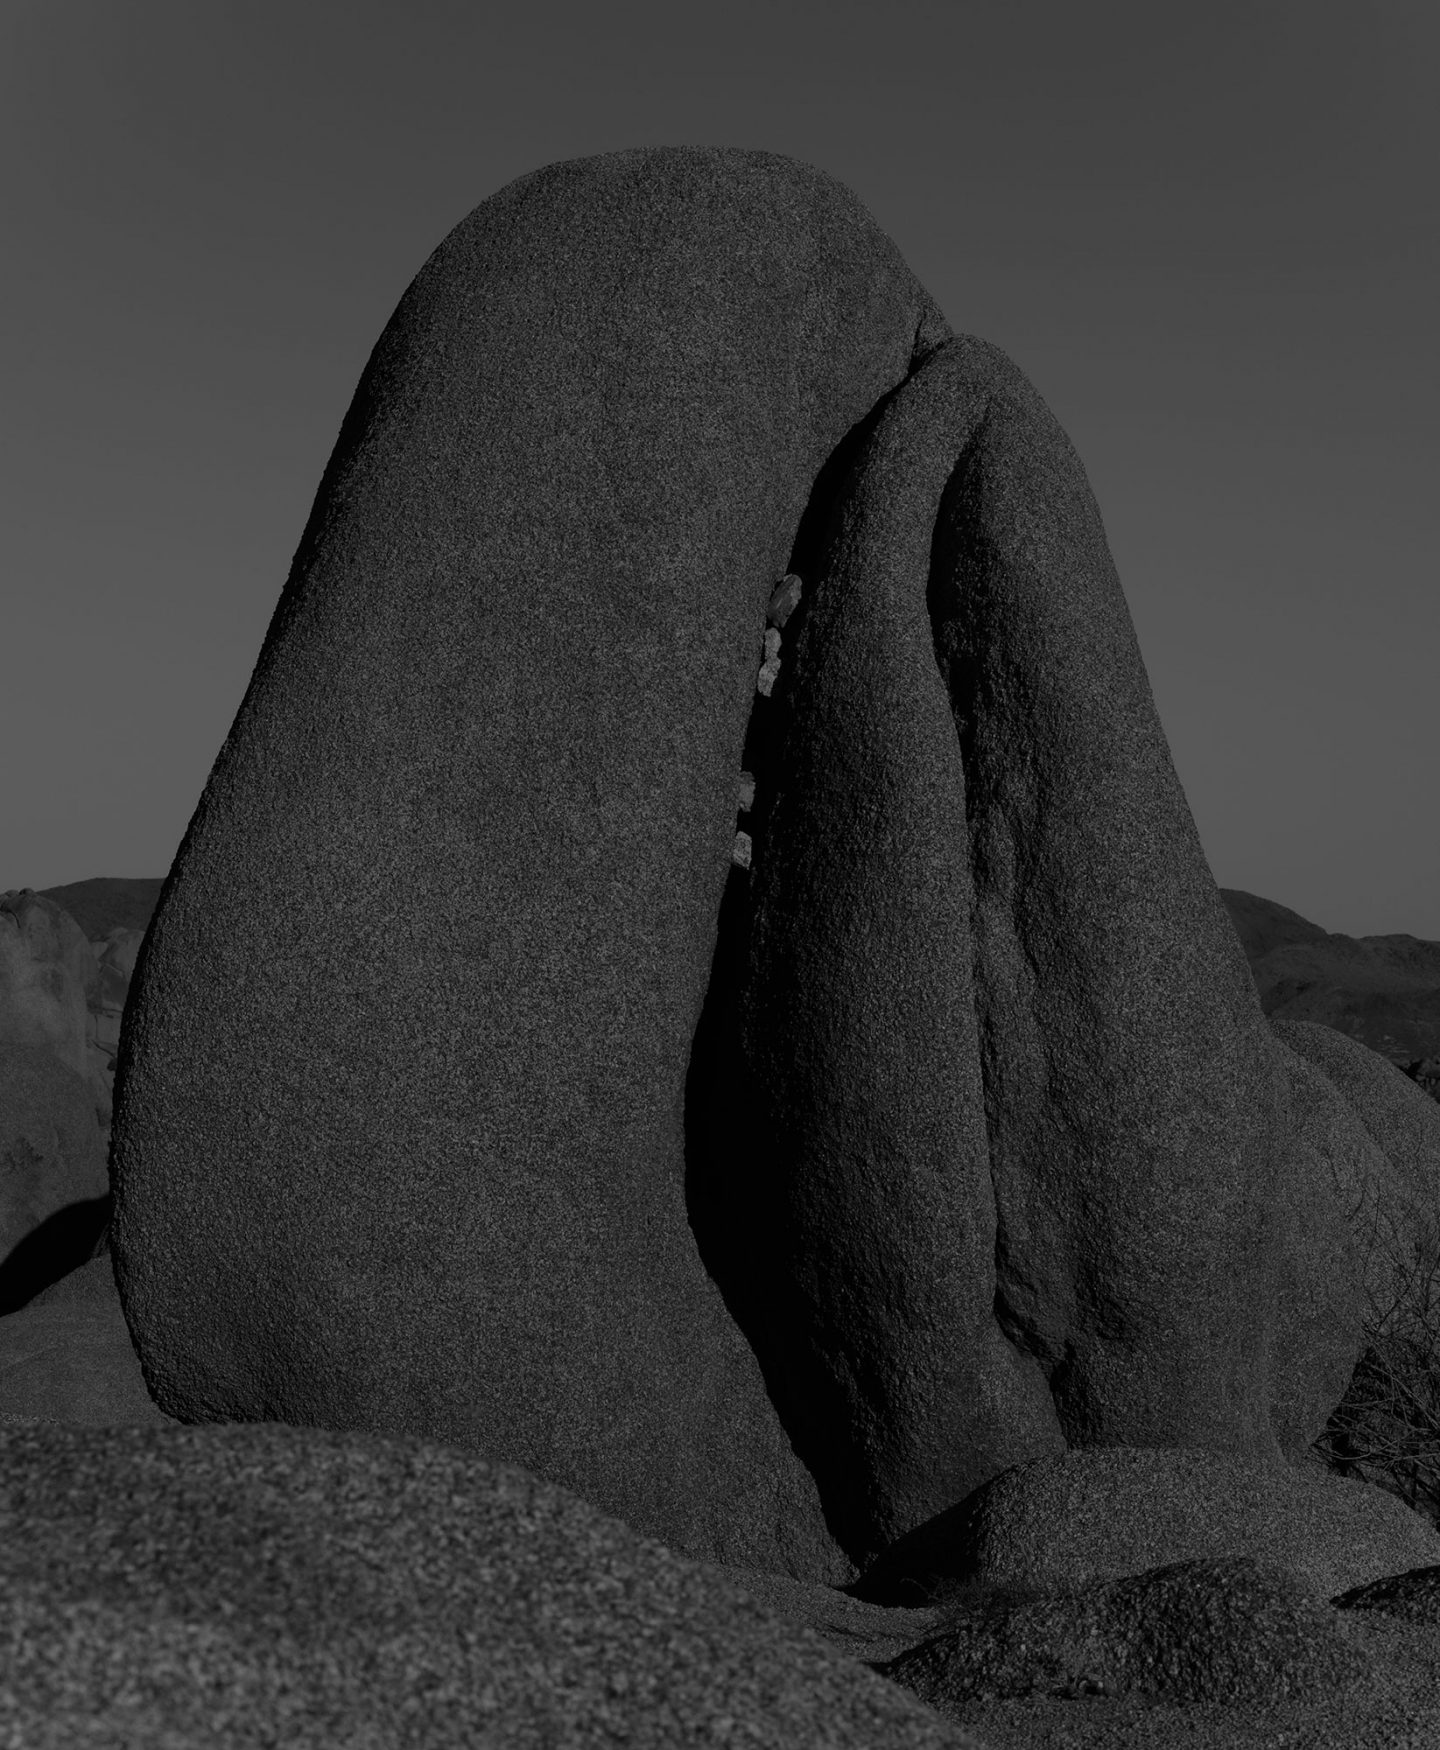 #IGNANT-Photography-MarcusSchaefer-14